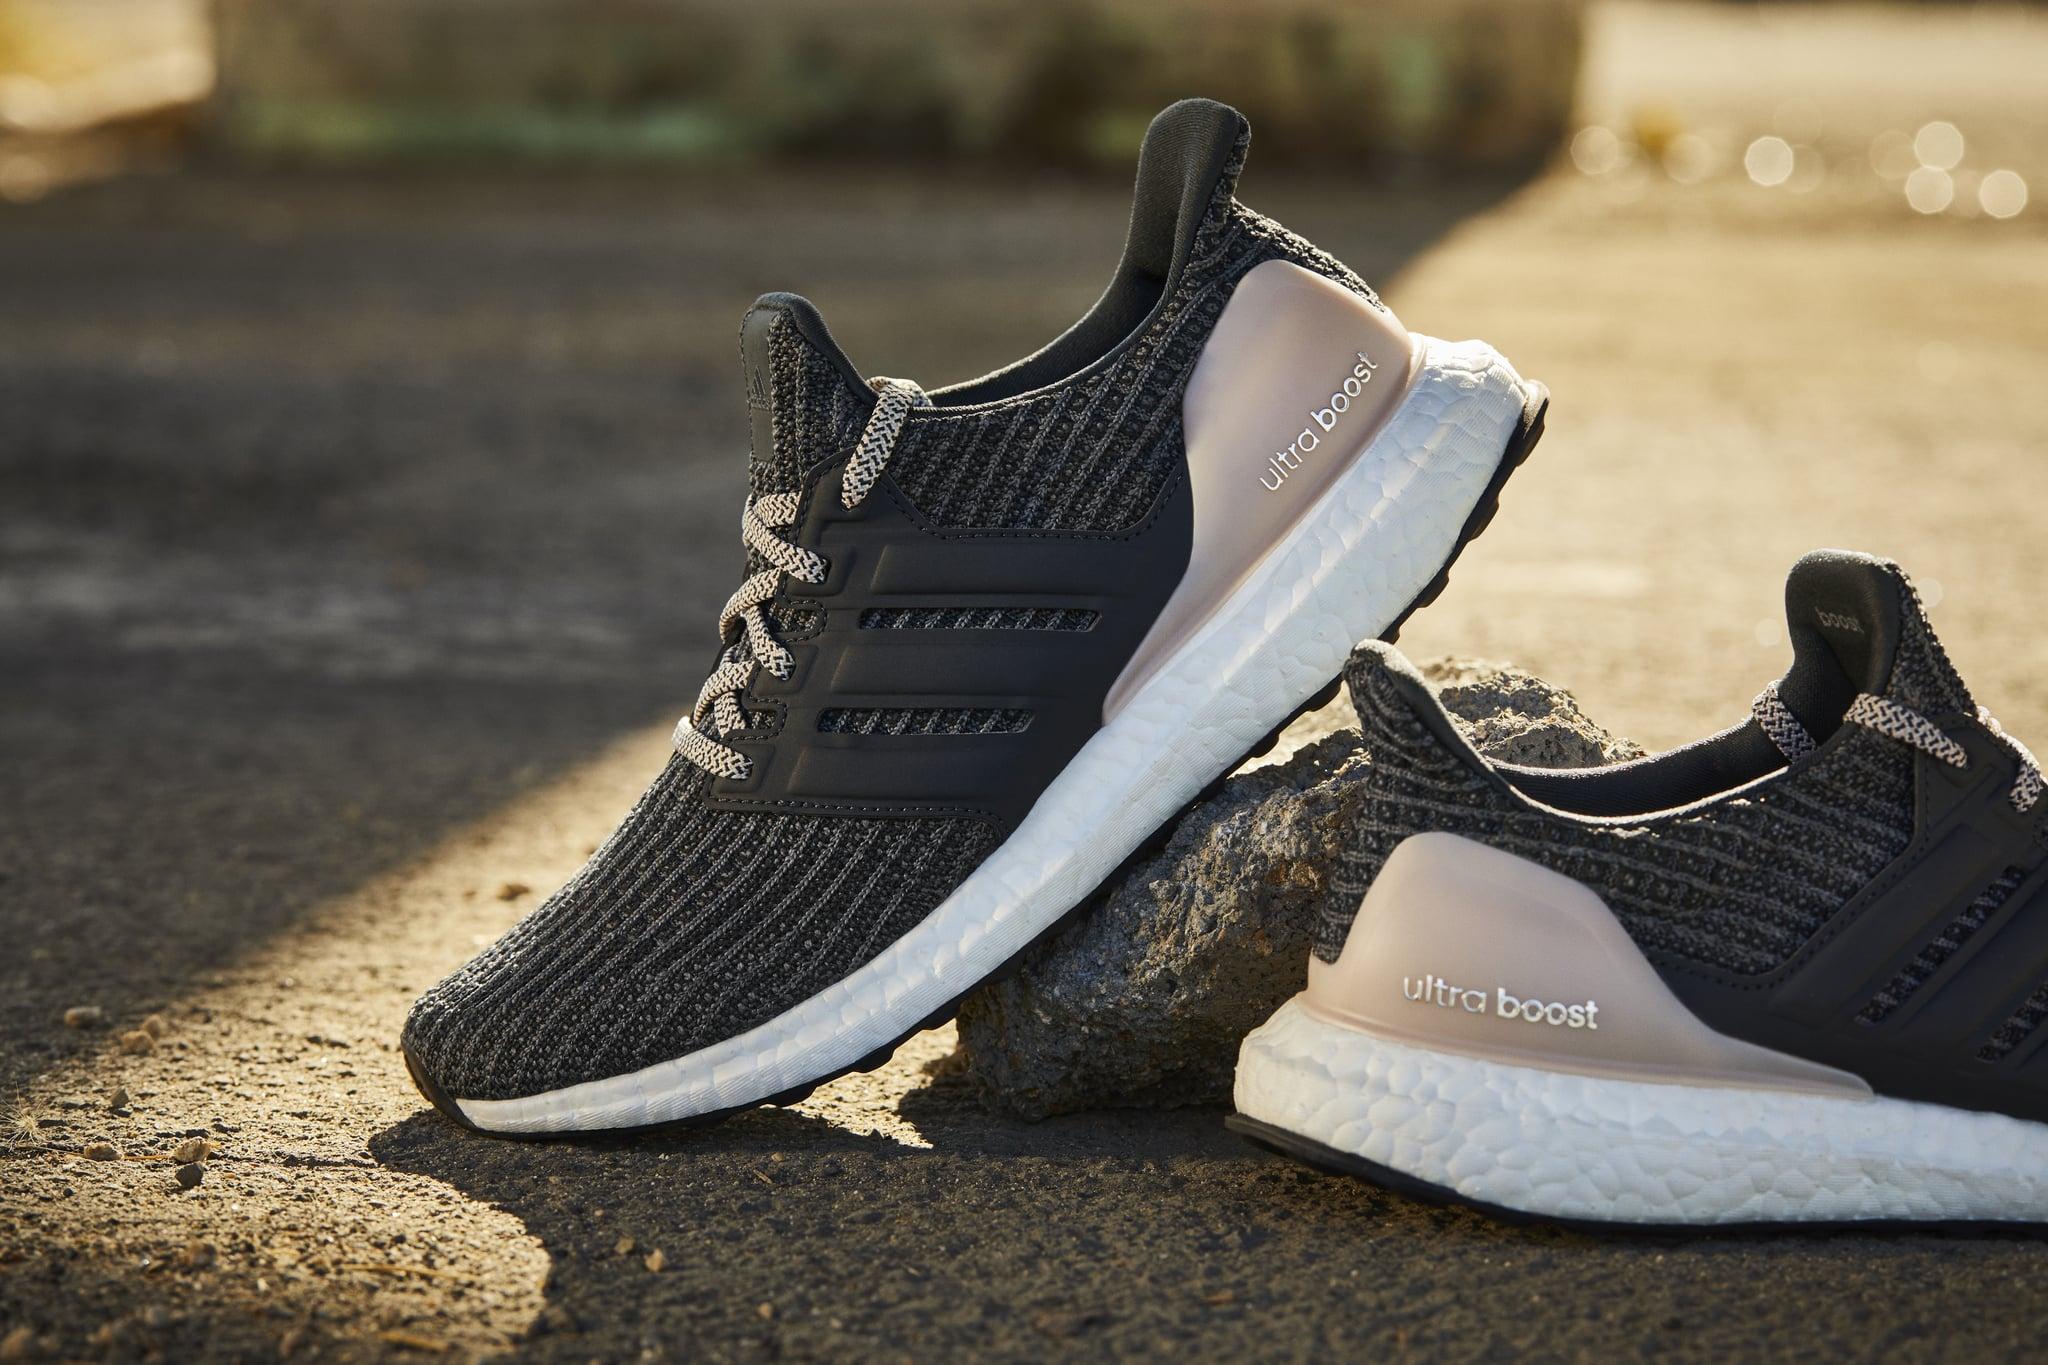 31ddef66e Image Source  adidas. Join the conversation. Women s RunningRunning  ShoesAdidasRunning